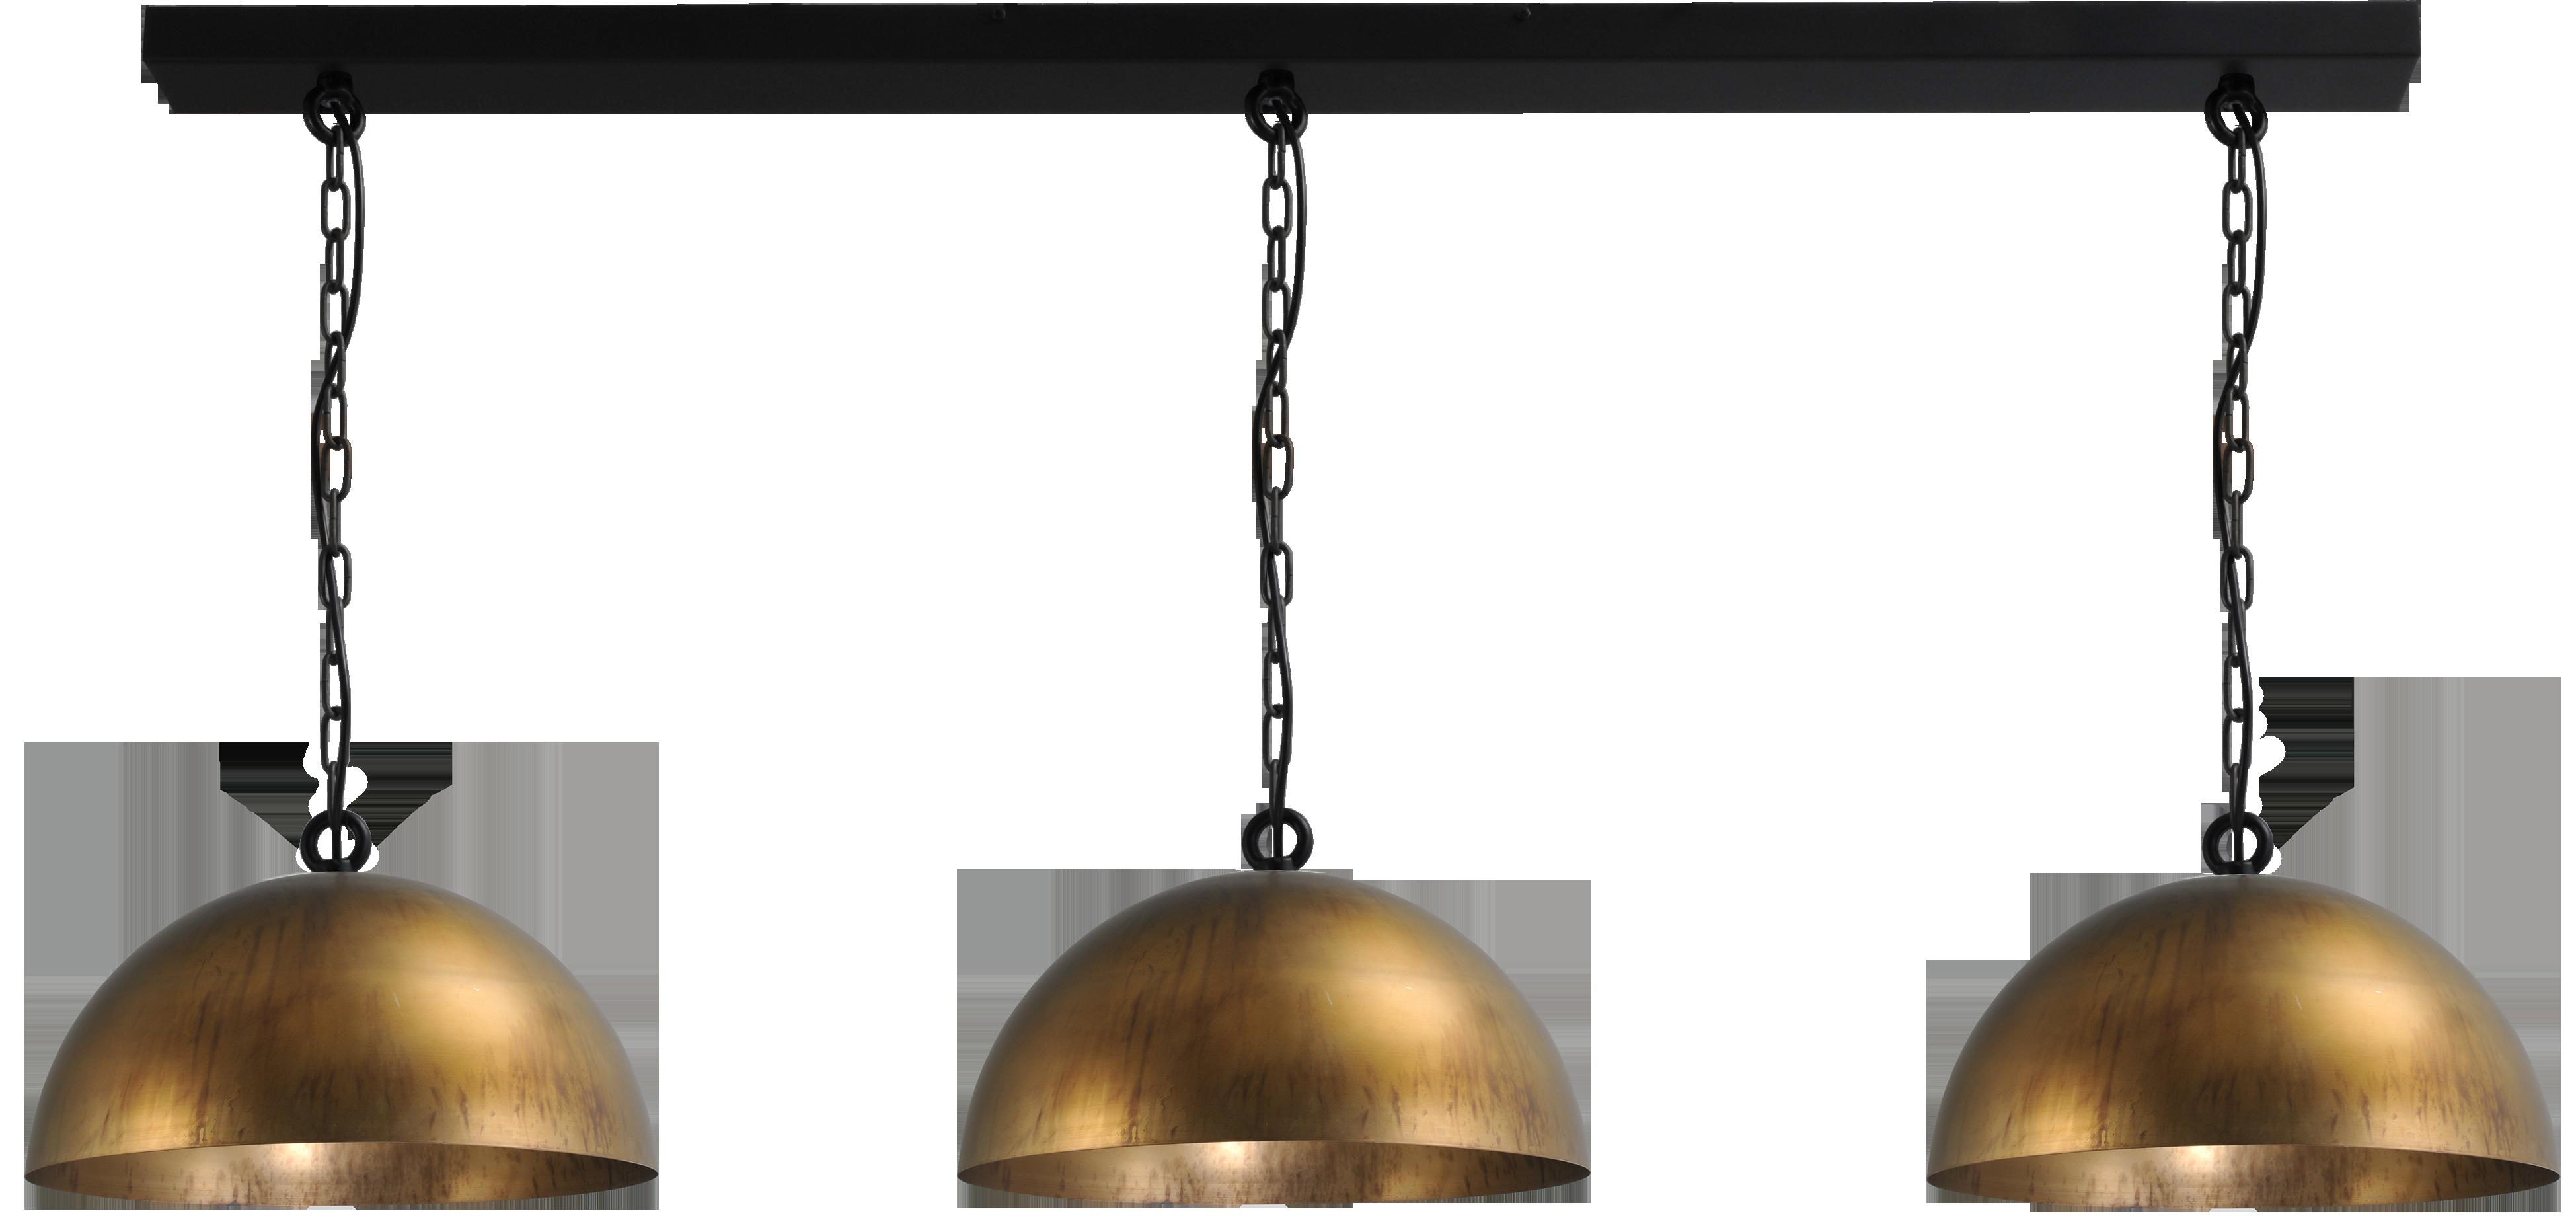 Larino Antique Brass HL LARINO 3LTS Ø40CM ANTIQUE BRASS/ANTIQUE BRASS